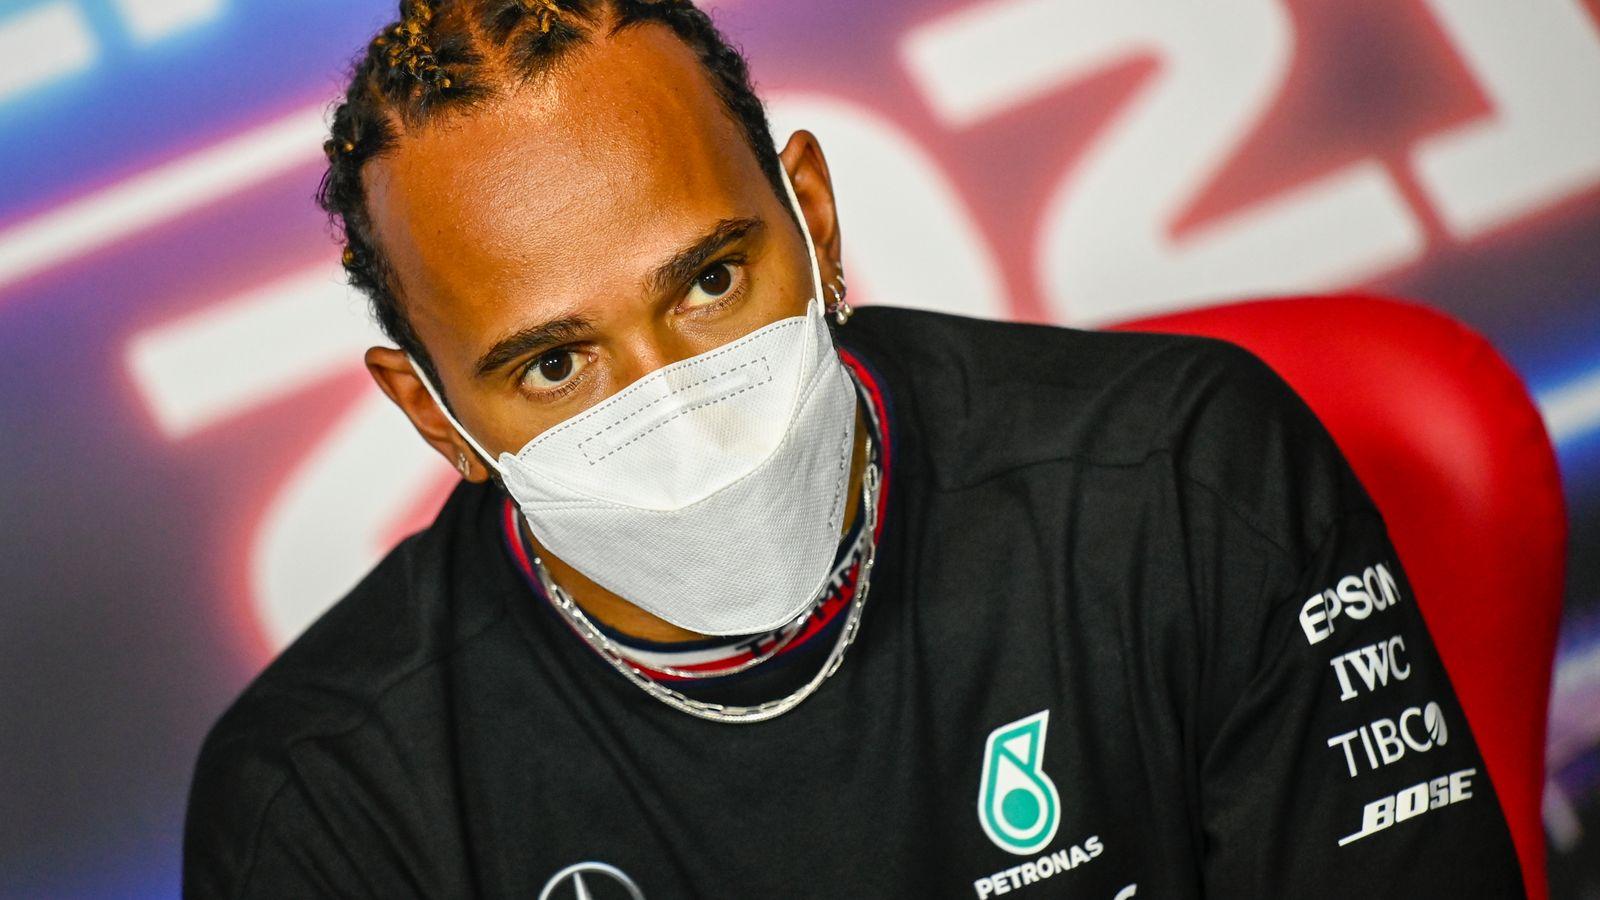 Lewis Hamilton reveals Mercedes talks underway for new Formula 1 contract into 2022 season